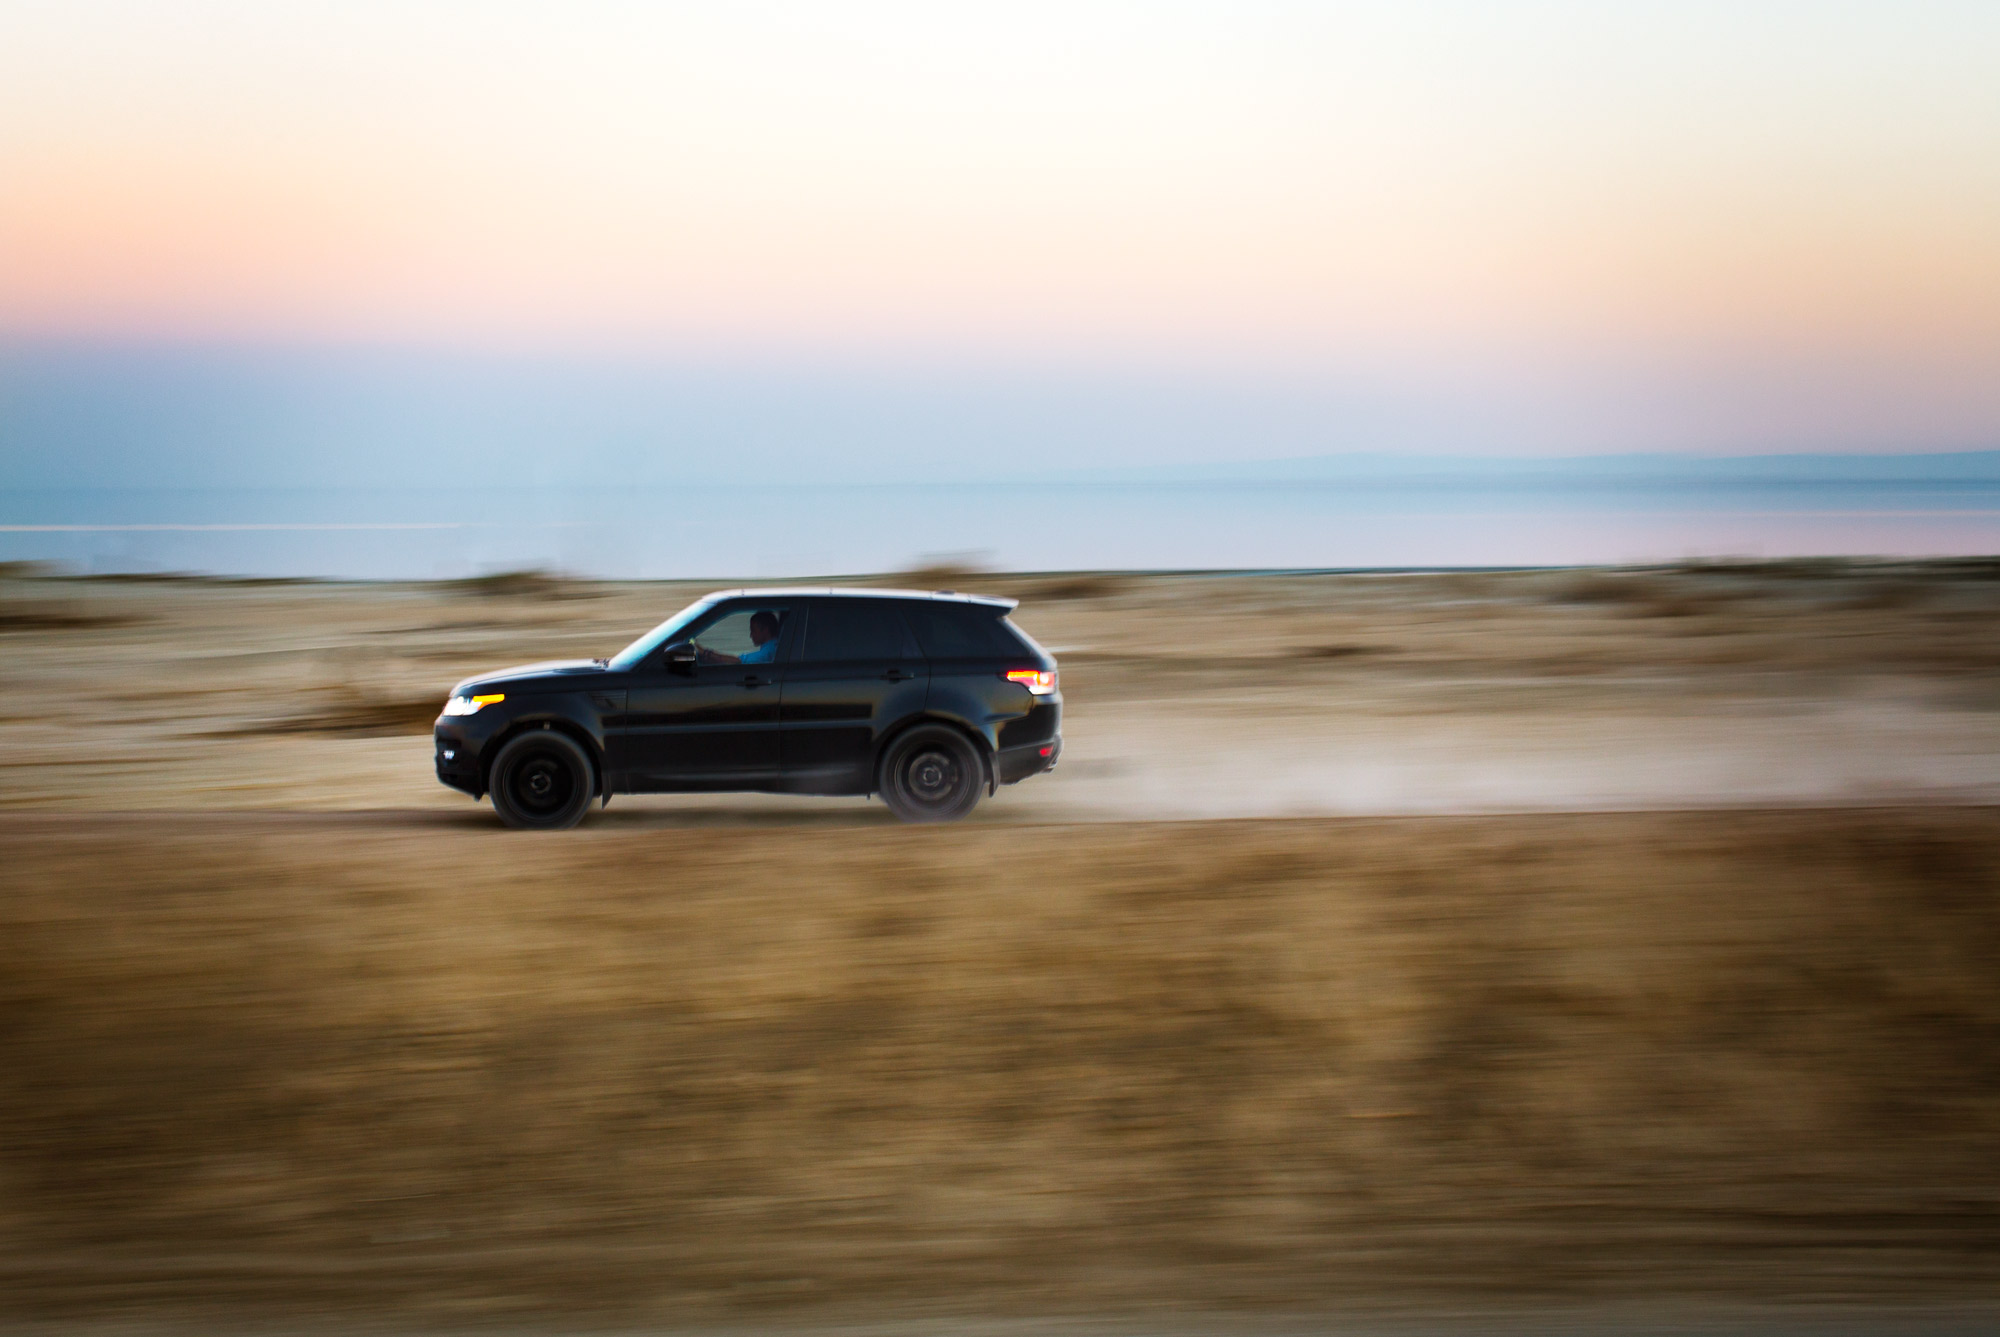 automotive-lifestyle-lou-mora-312.jpg